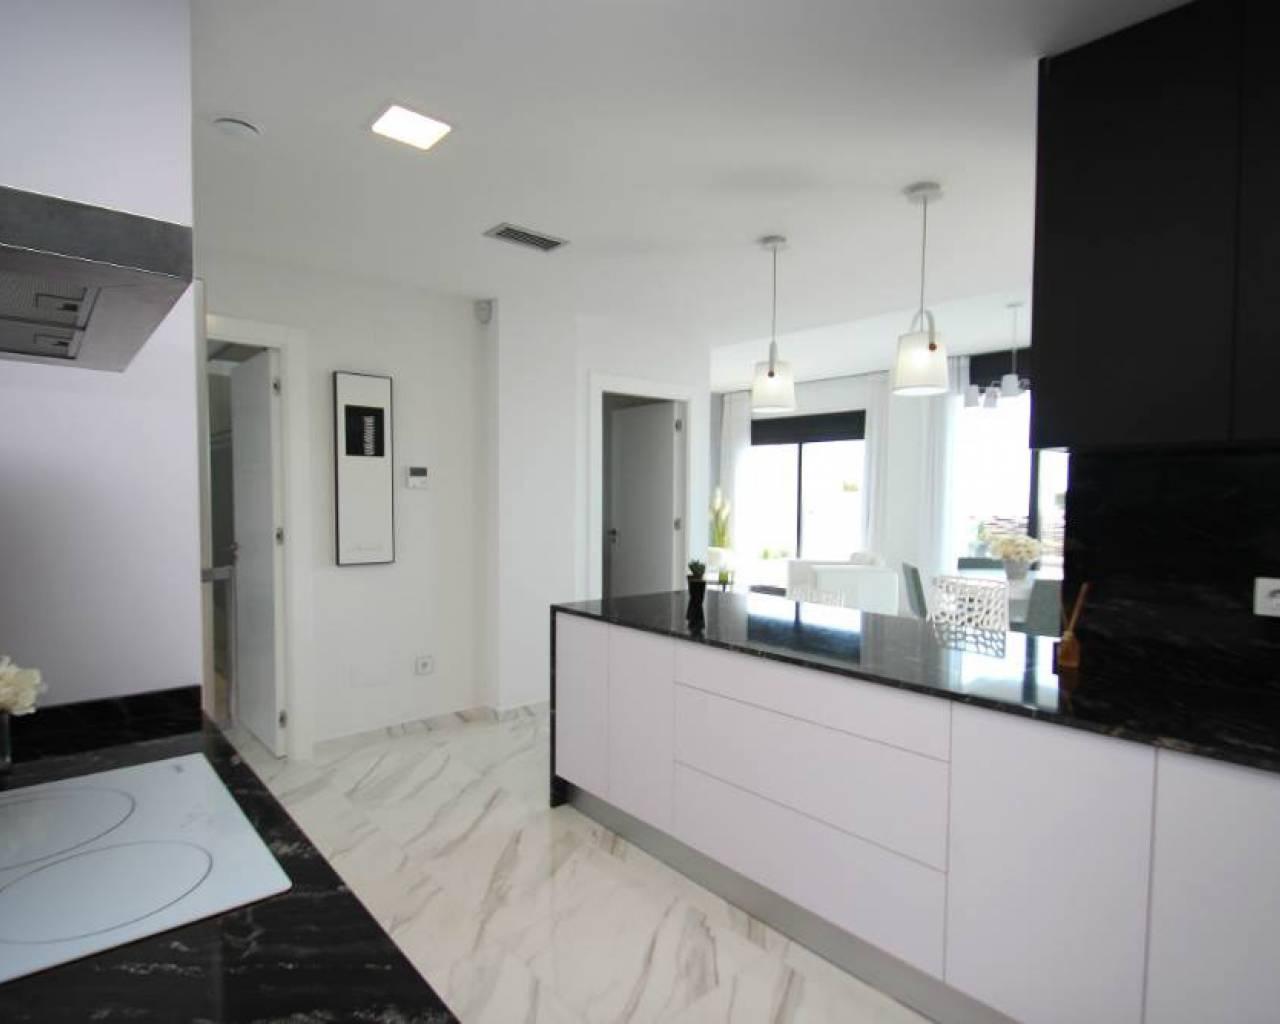 nieuwbouw-appartement-san-miguel-de-salinas_319_xl